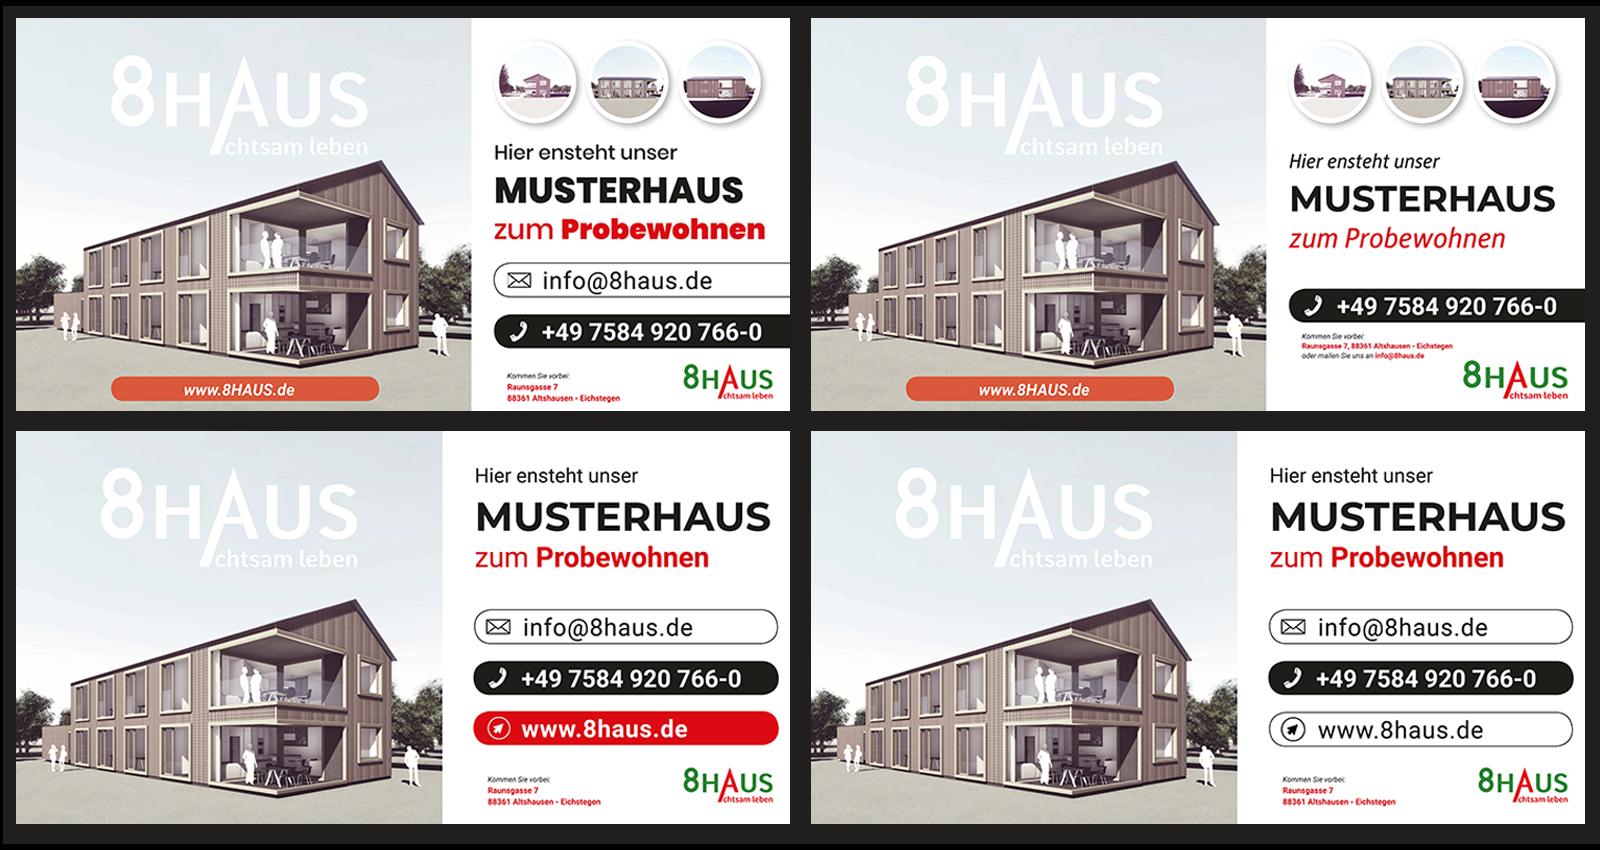 8HAUS_Bauzaunbanner_Entwürfe